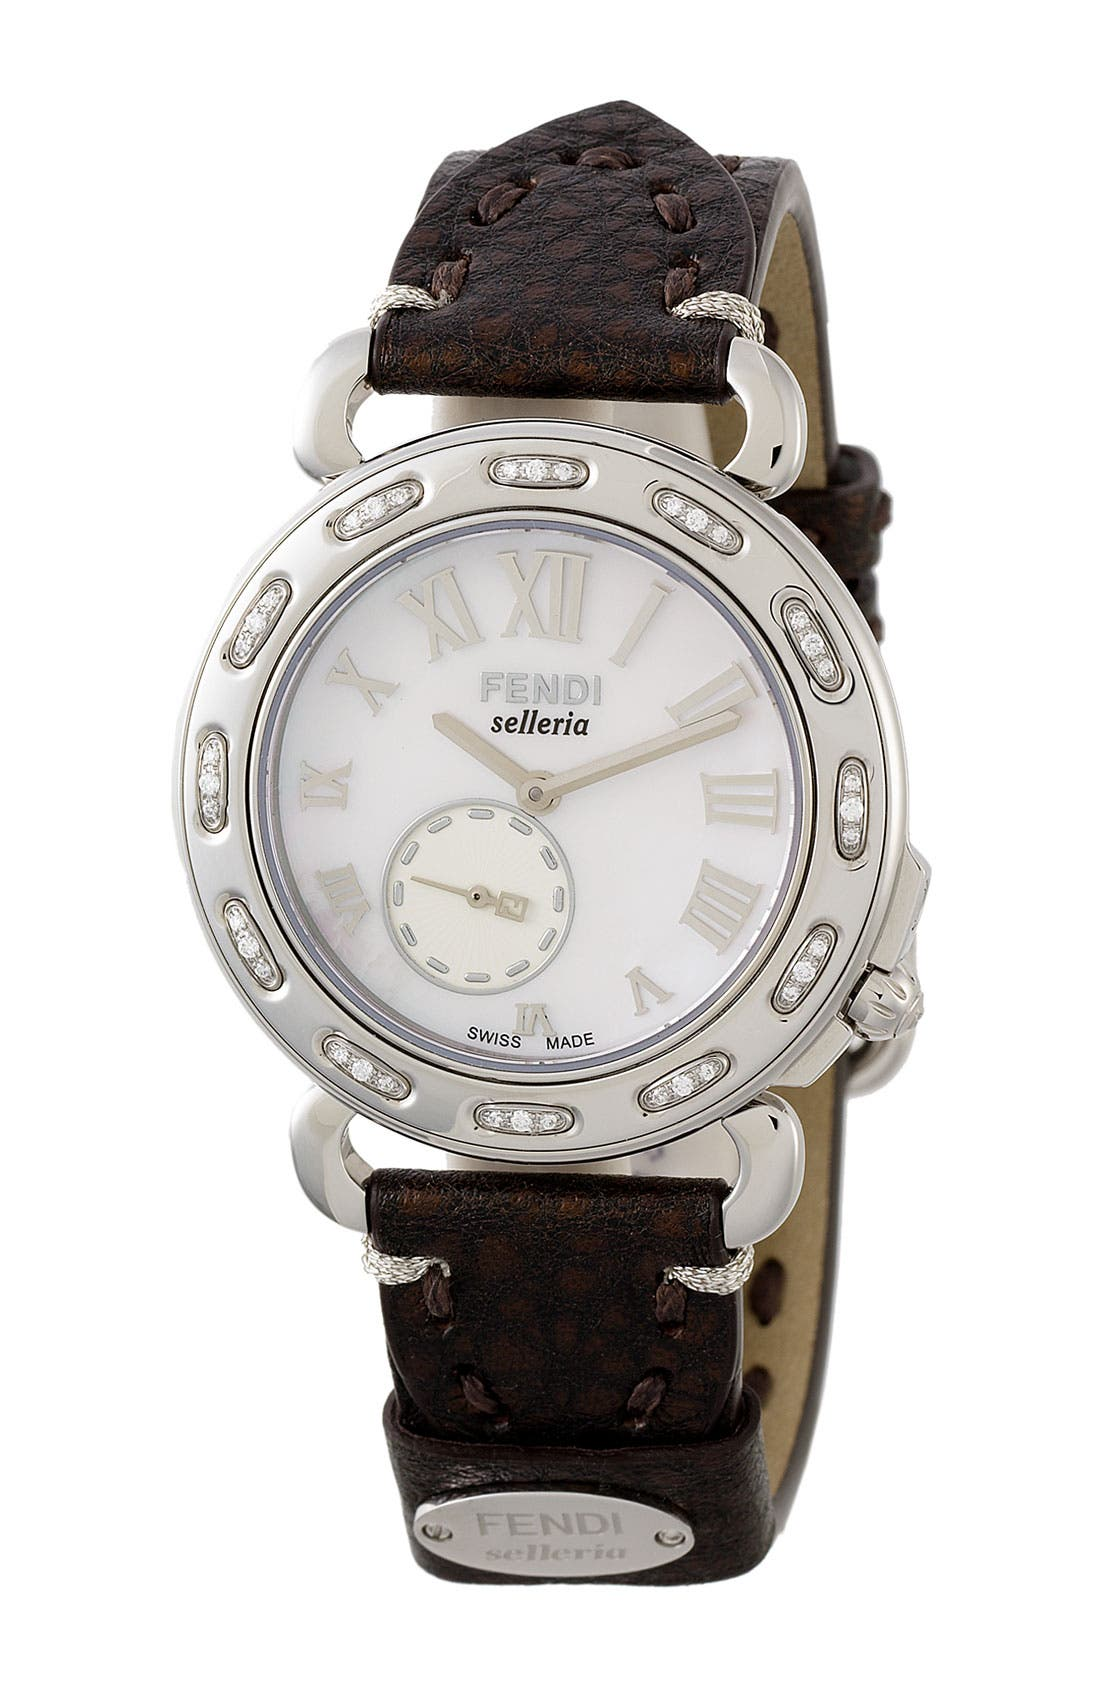 Alternate Image 1 Selected - Fendi 'Selleria' Diamond Customizable Watch